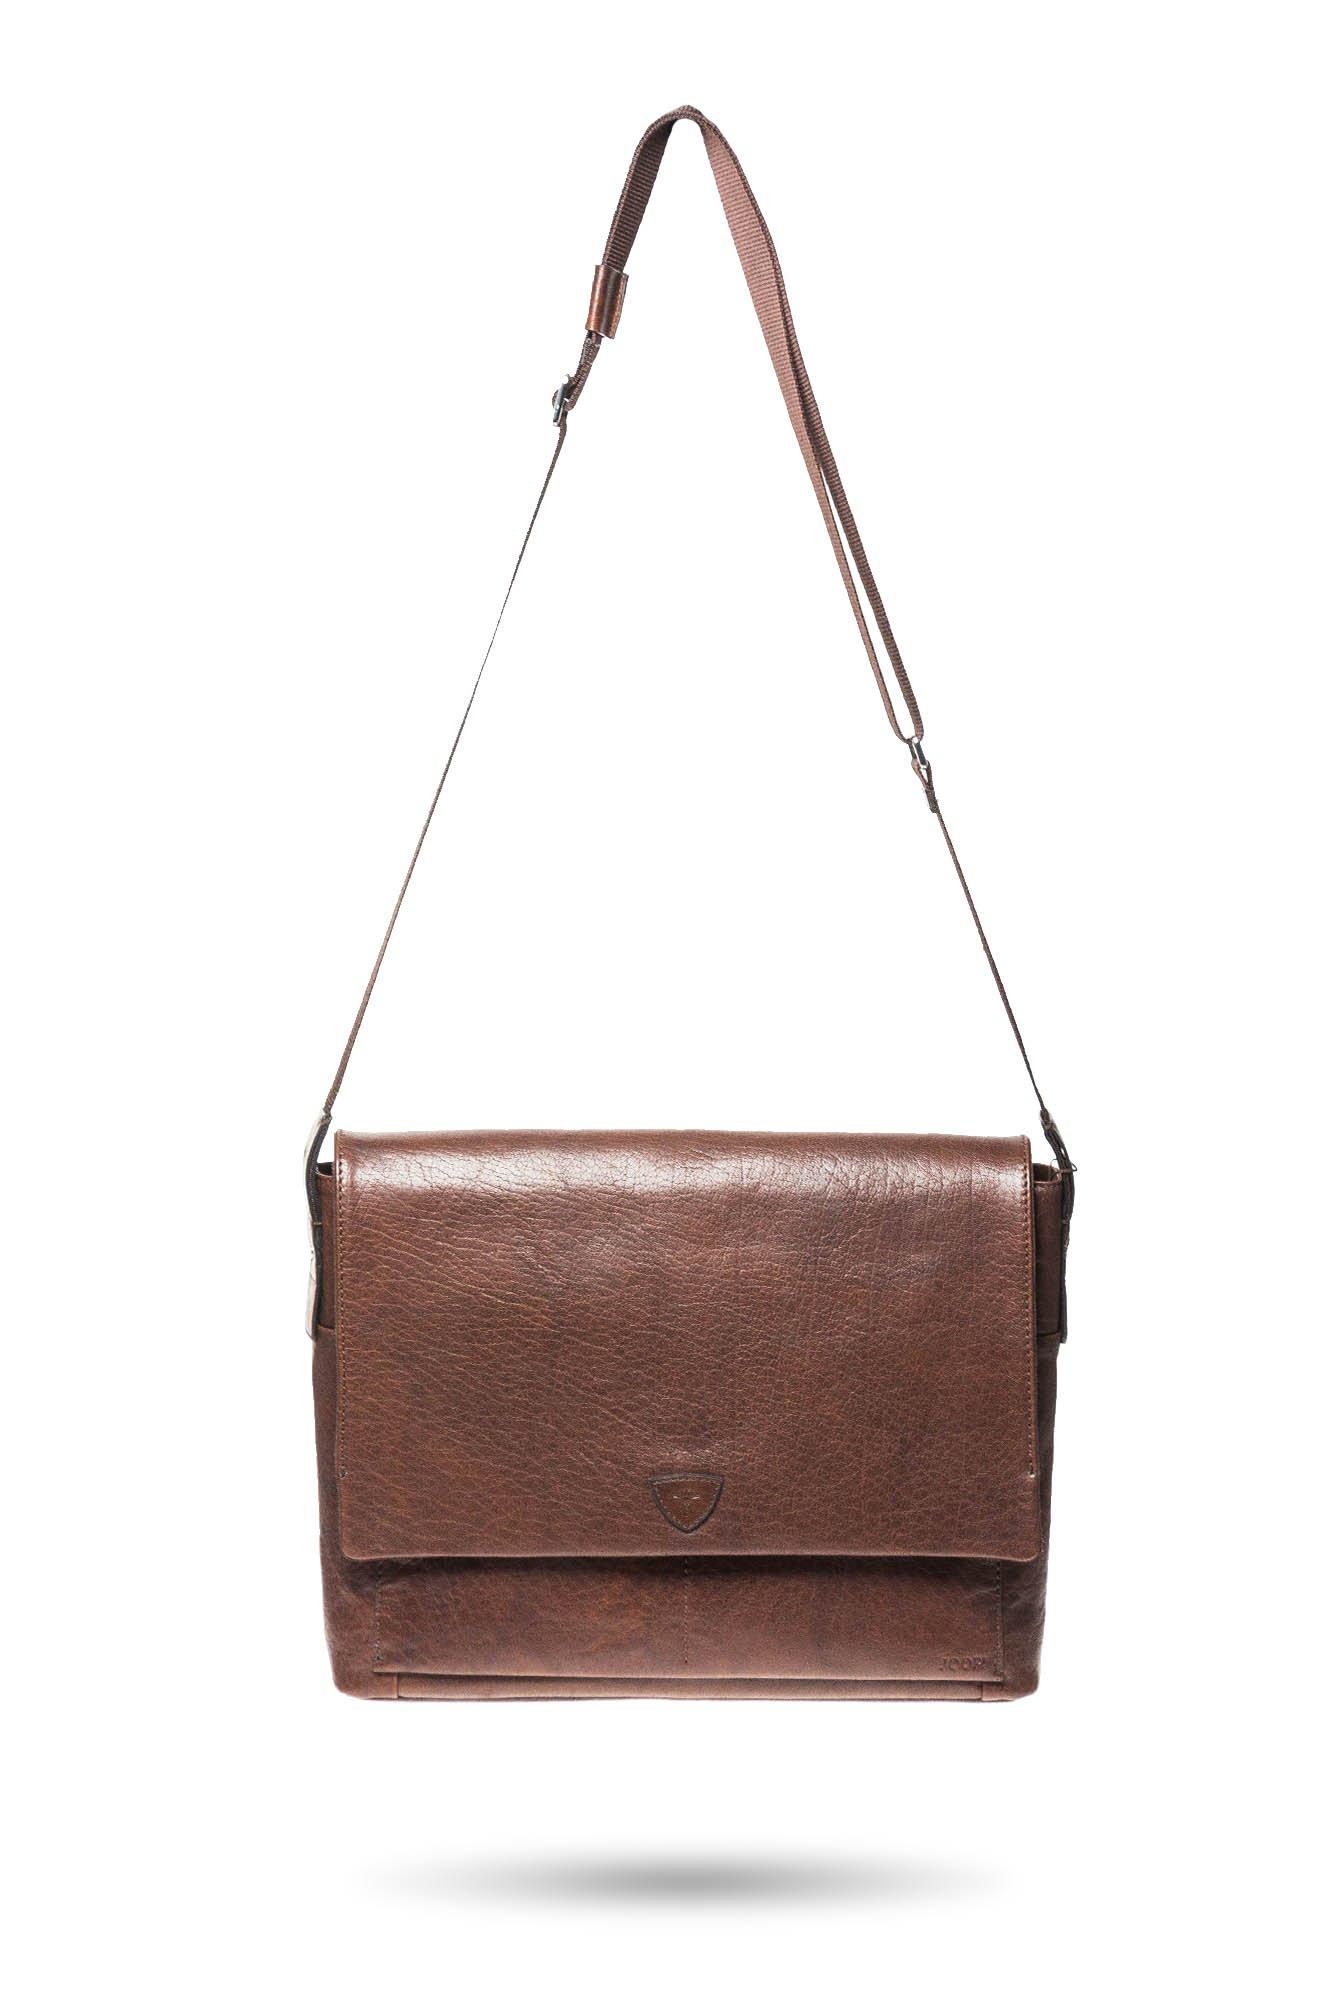 af0110af751f8 ... Brązowa skórzana torba na laptopa Joop Brenta Kimon ...